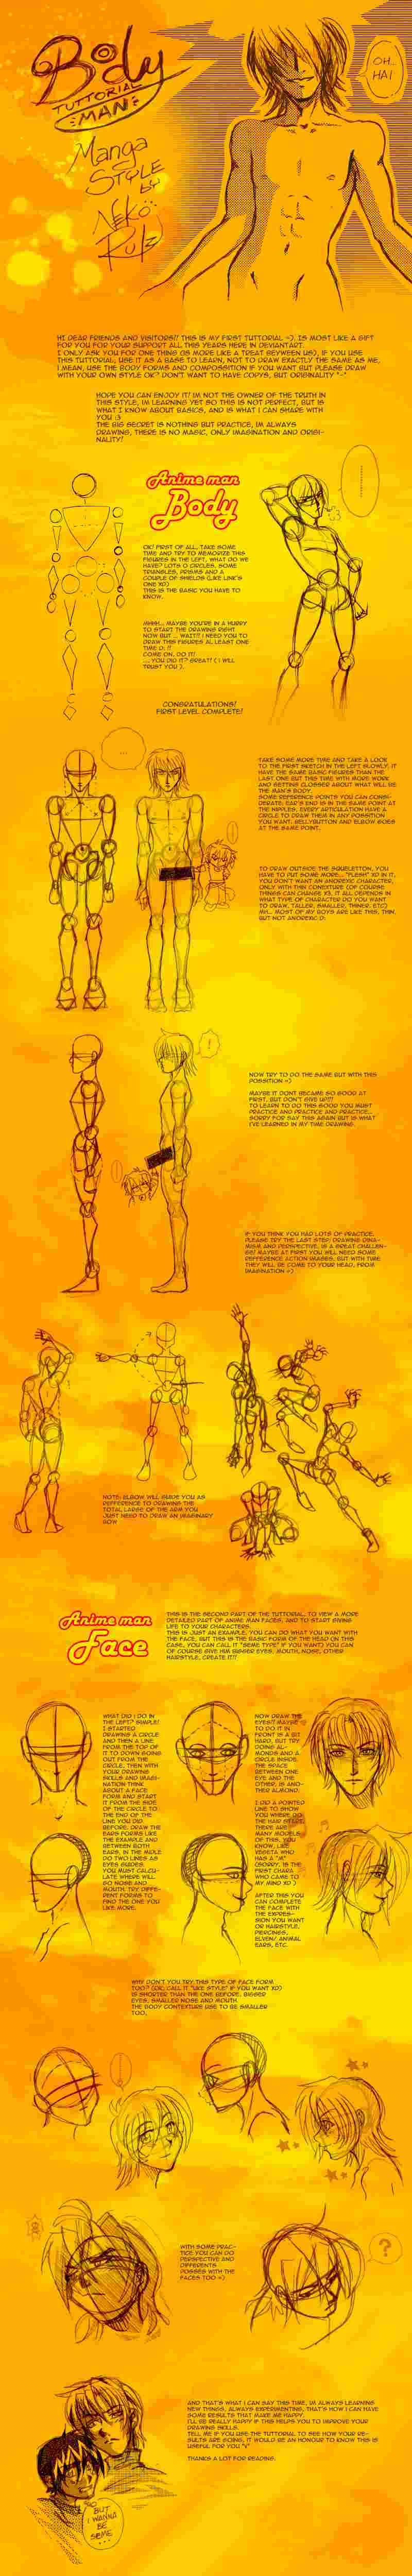 Vos dessins hors sujet - Page 4 Corps_11